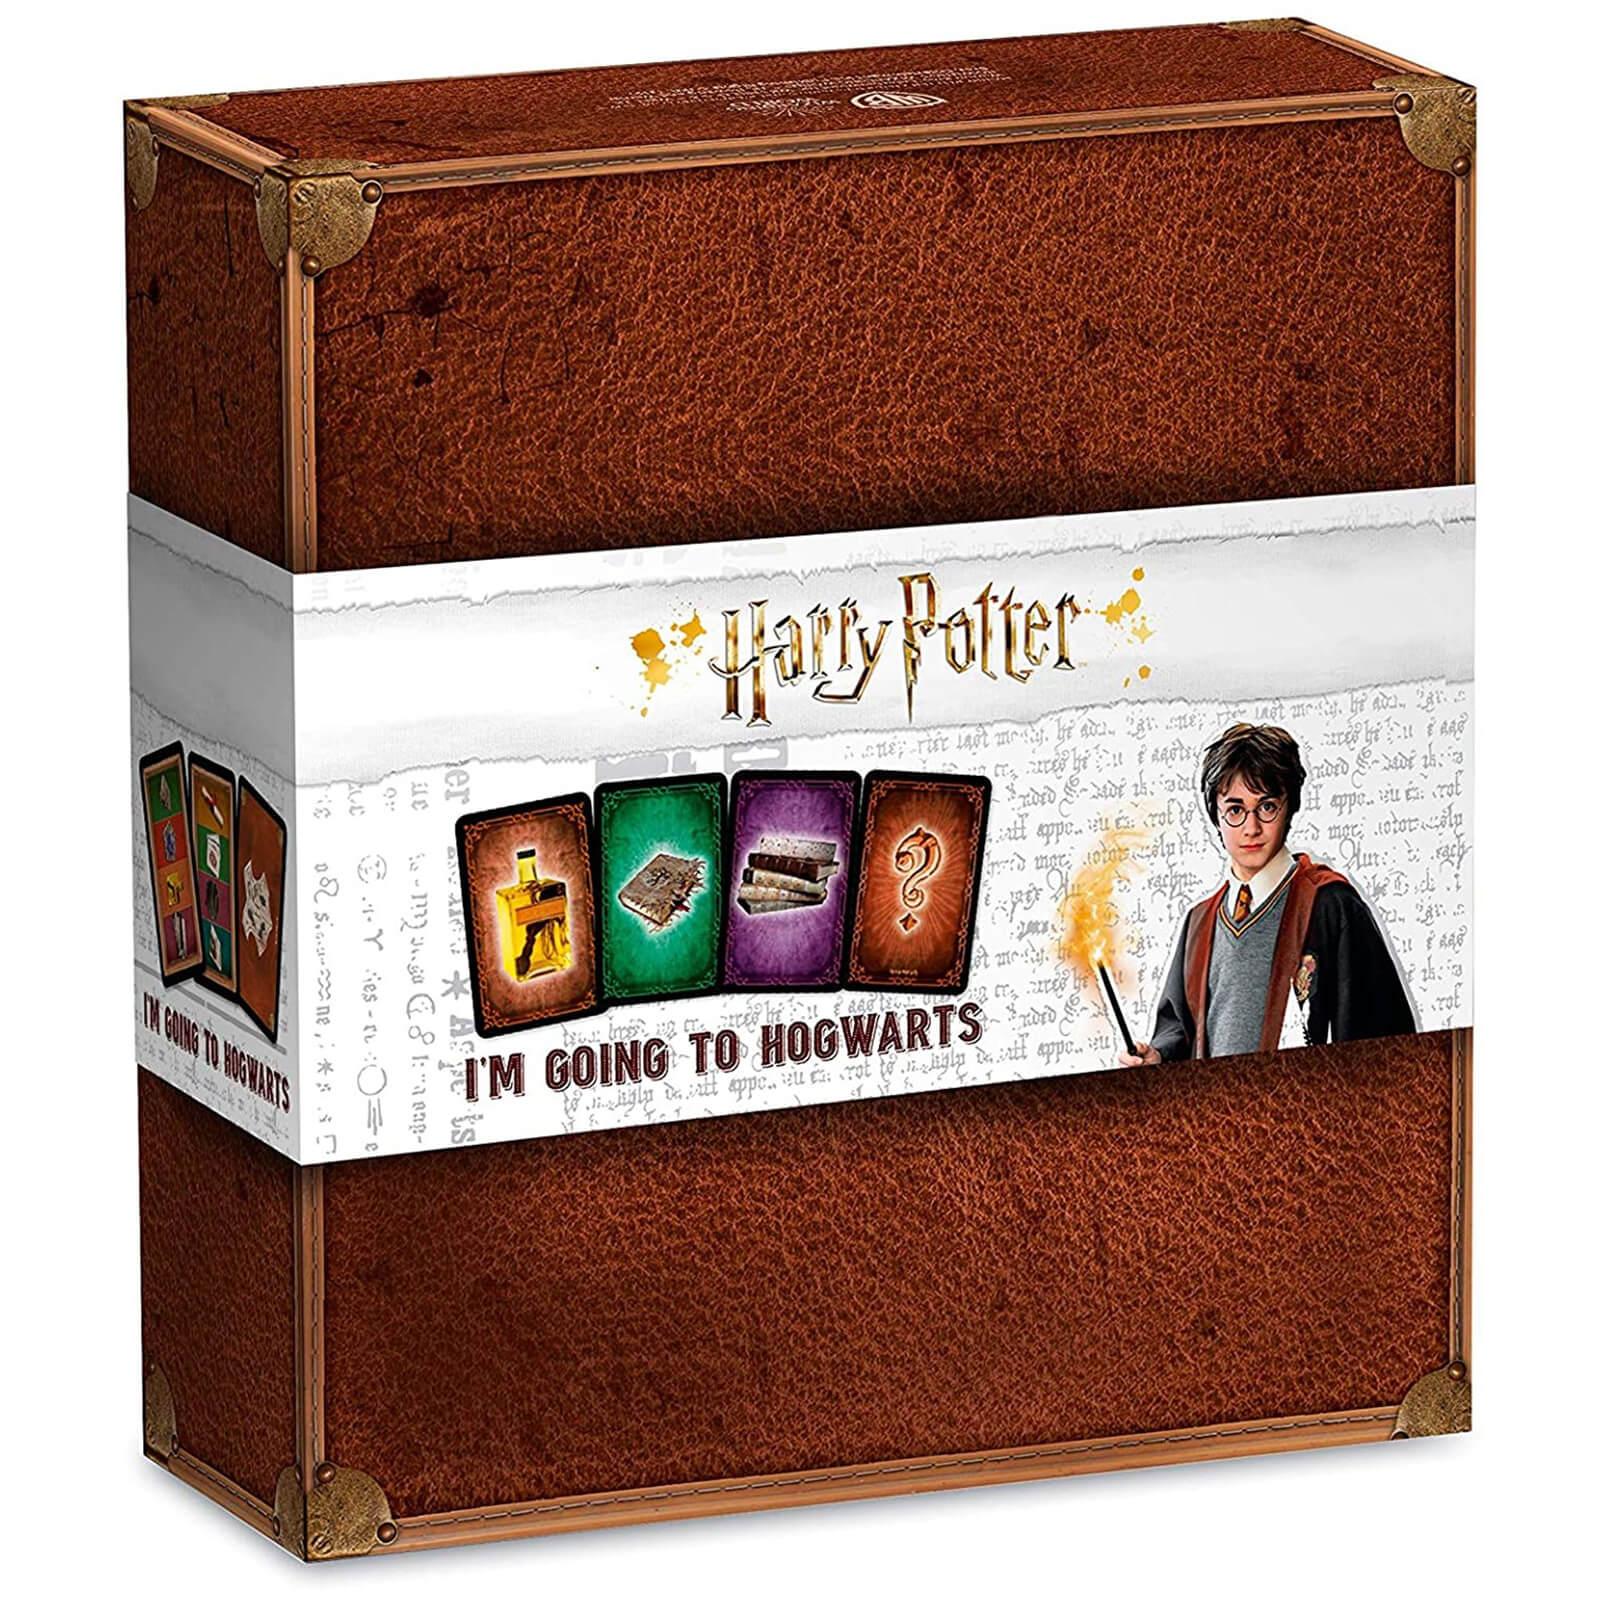 Image of Harry Potter I Go To Hogwarts Card Game